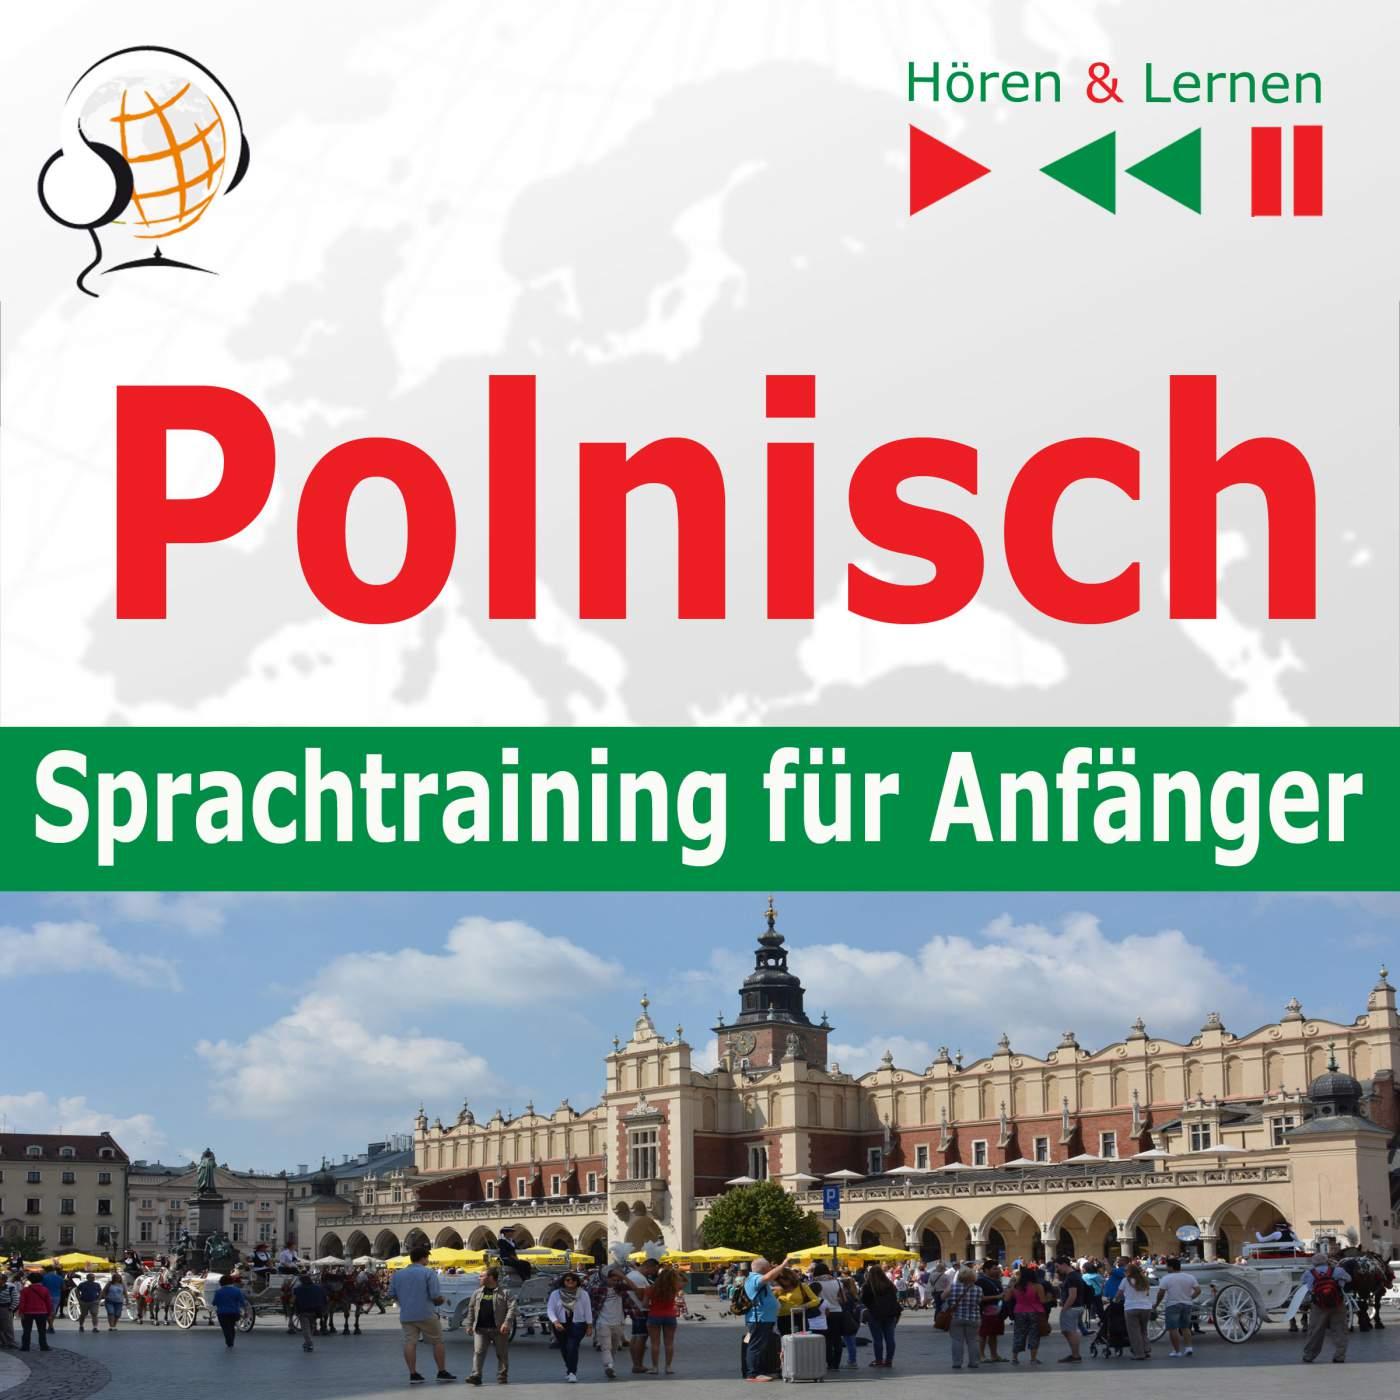 Polnisch – Sprachtraining fur Anfanger 30 Alltagsthemen auf Niveau A1-A2 (Hören & Lernen) - Audiobook (Książka audio MP3) do pobrania w całości w archiwum ZIP